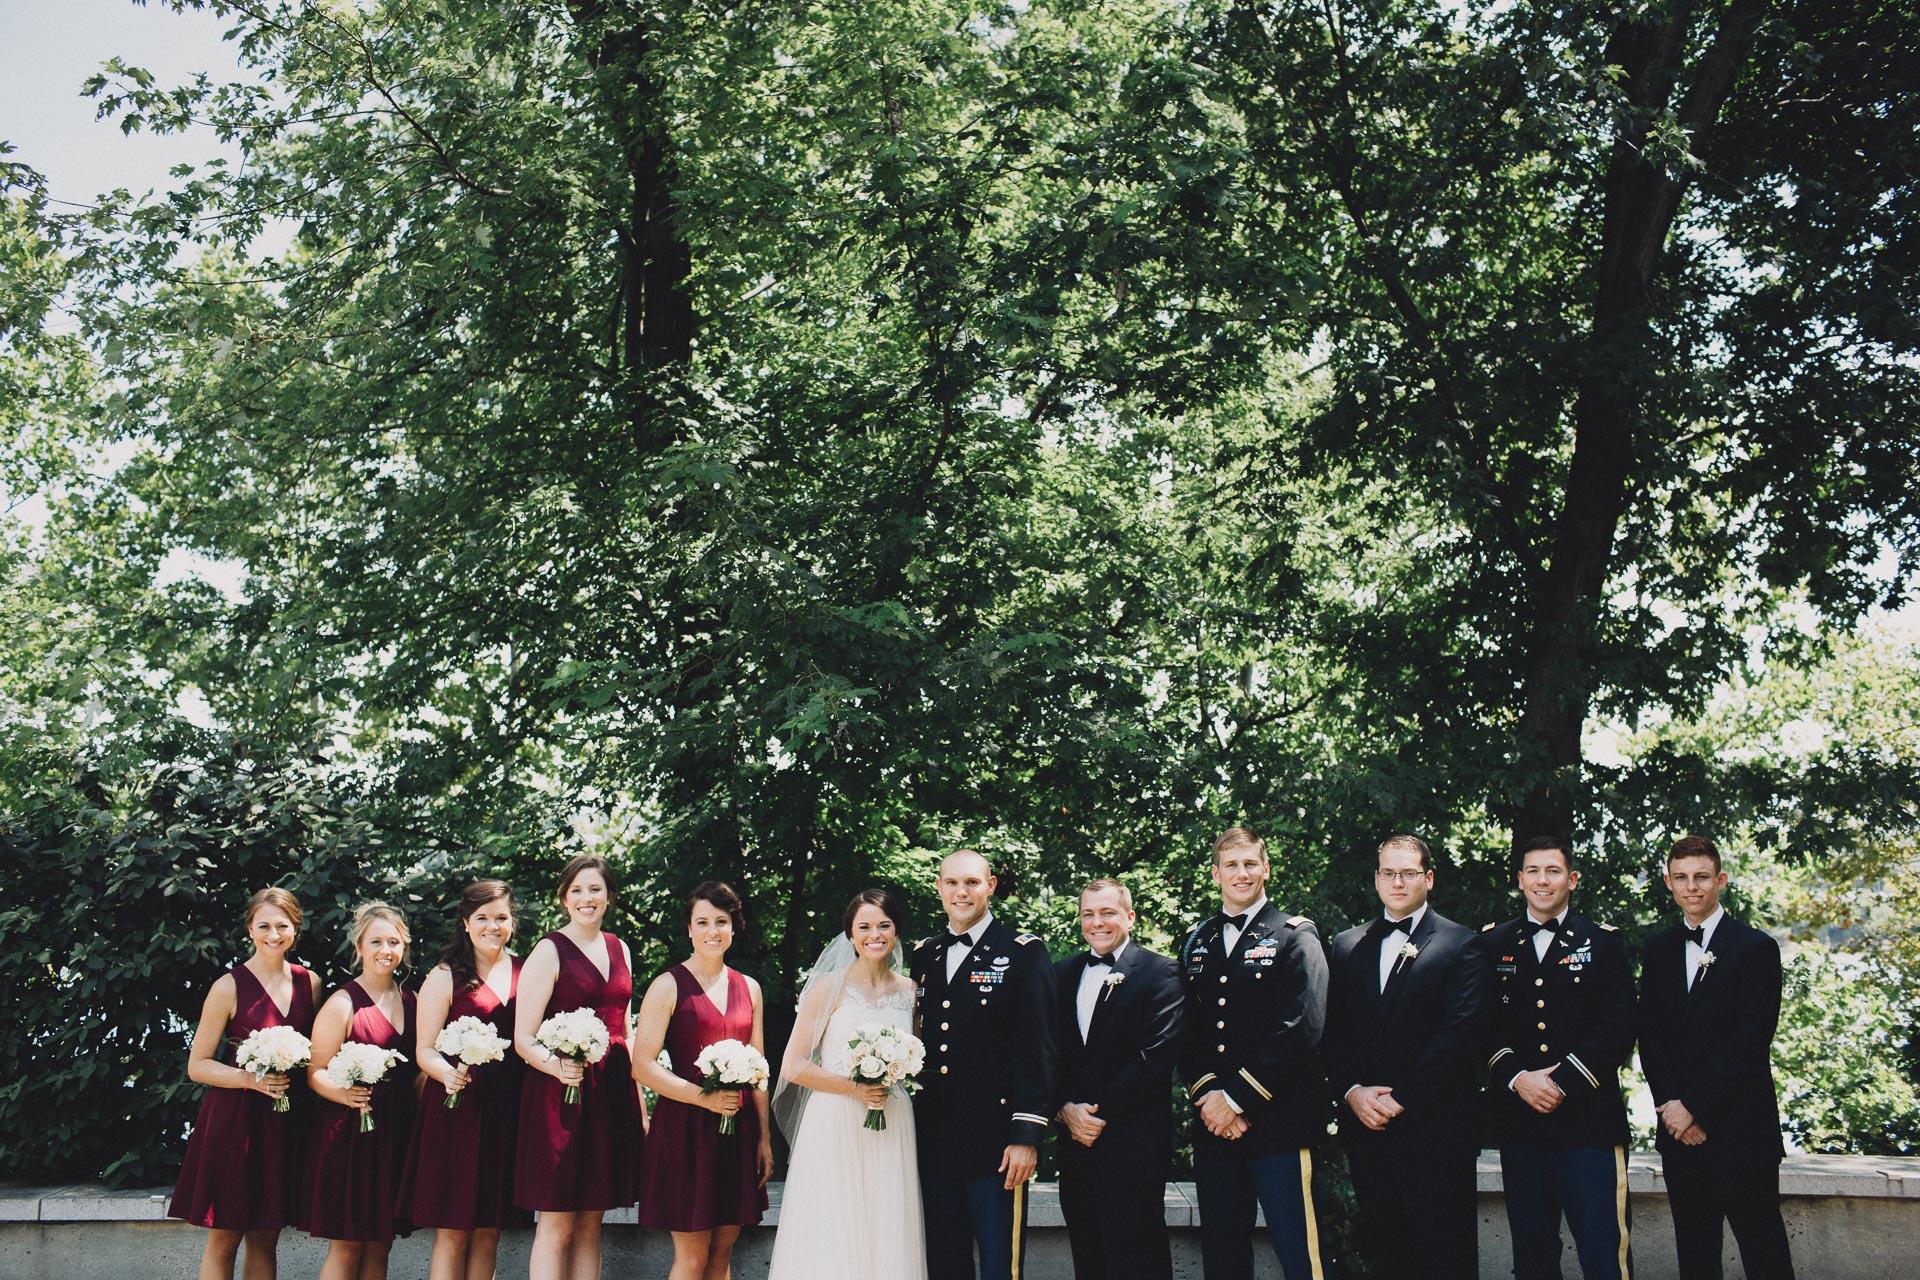 Emily-Eddie-Cincinnati-Rennaissance-Hotel-Wedding-039@2x.jpg